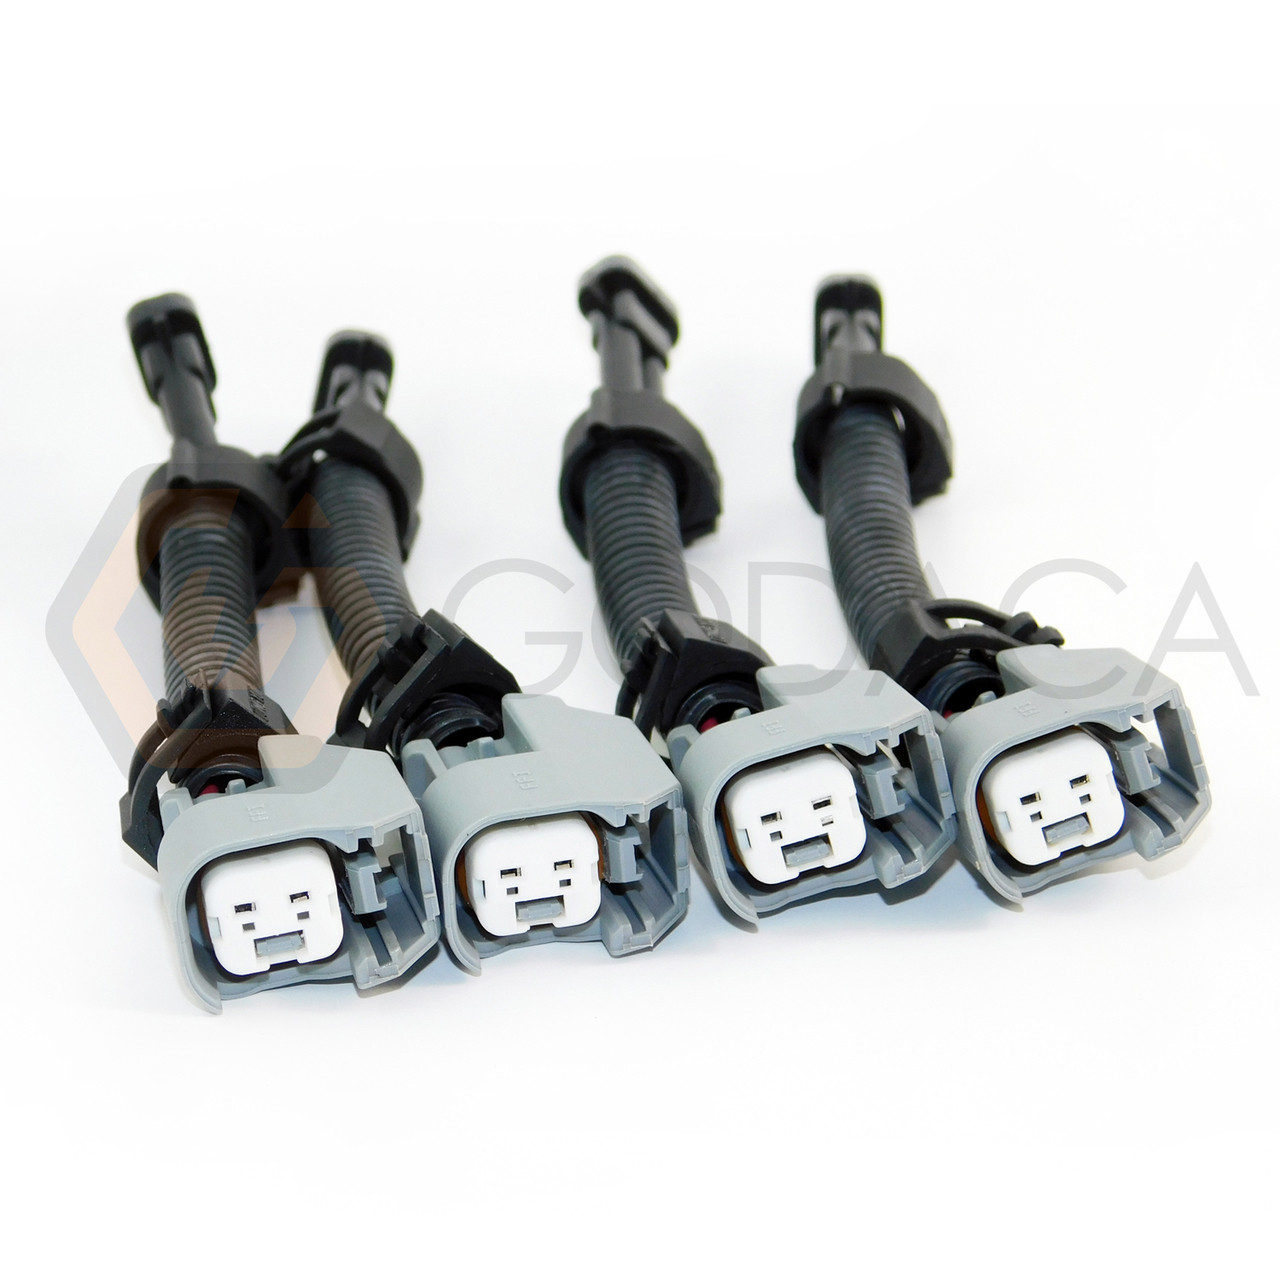 4x wiring harness adapter ev14 ev6 to male delphi mfp fuel injector for gm  - godaca, llc